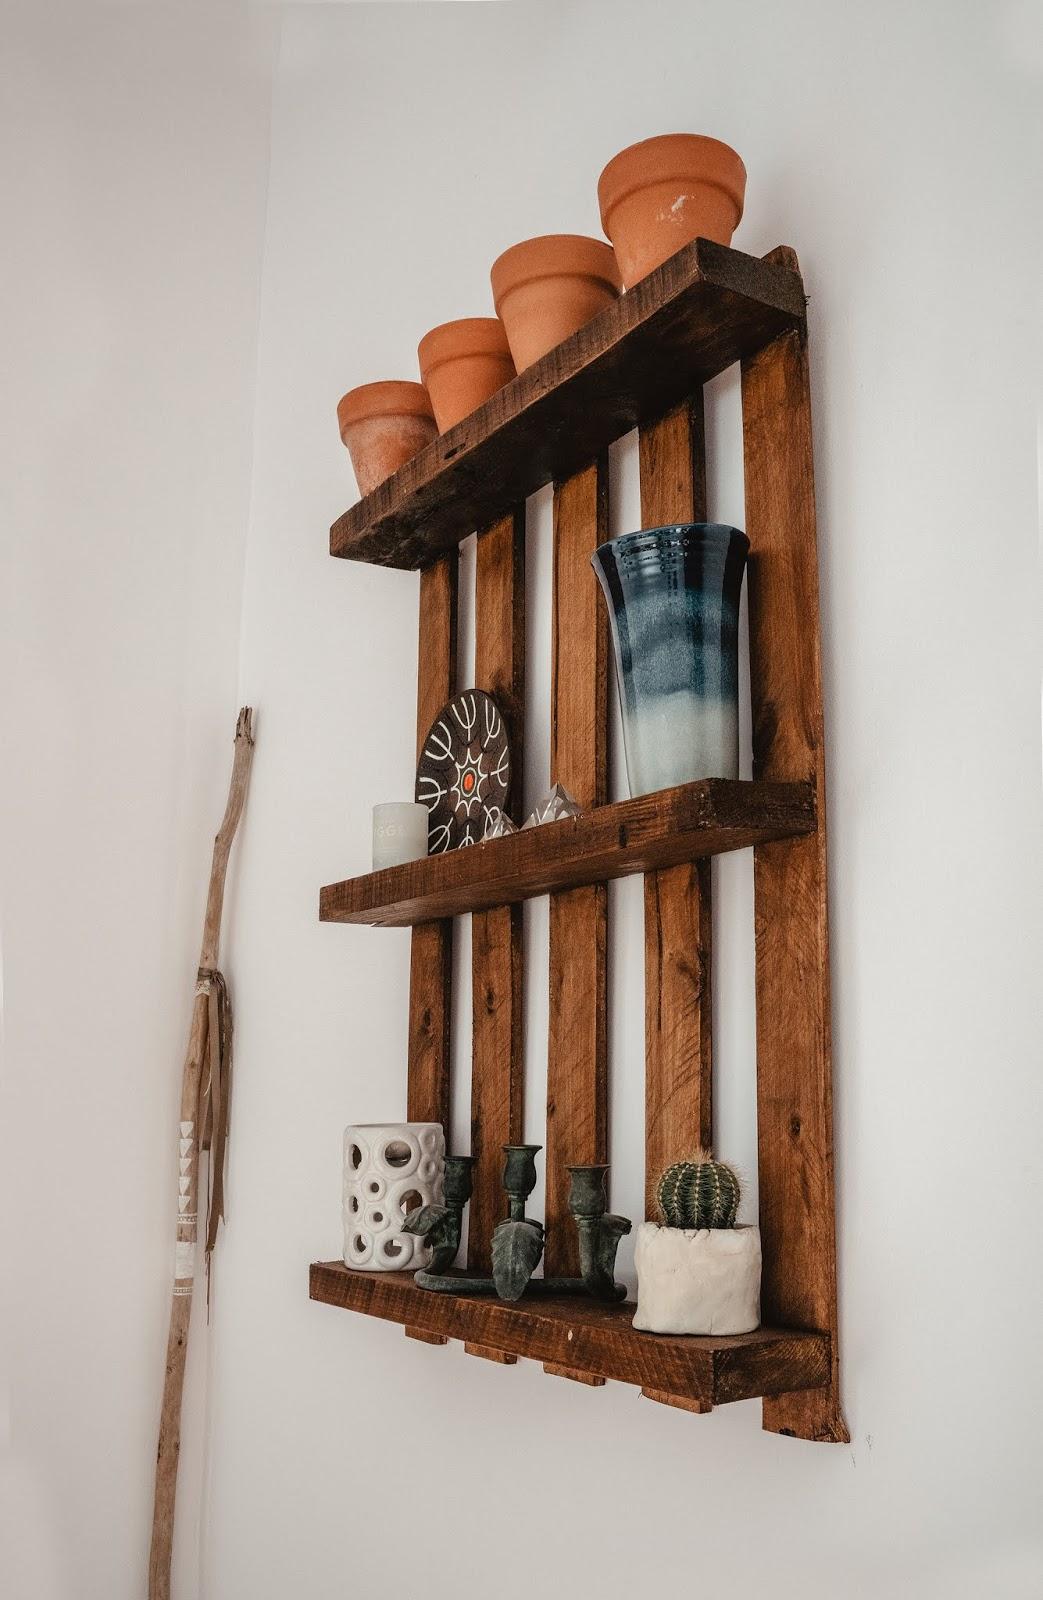 estanteria de palet, madera de palet, reciclar palet, palet, wooden palet, esenciaindie, decoracion indie, indie 2019